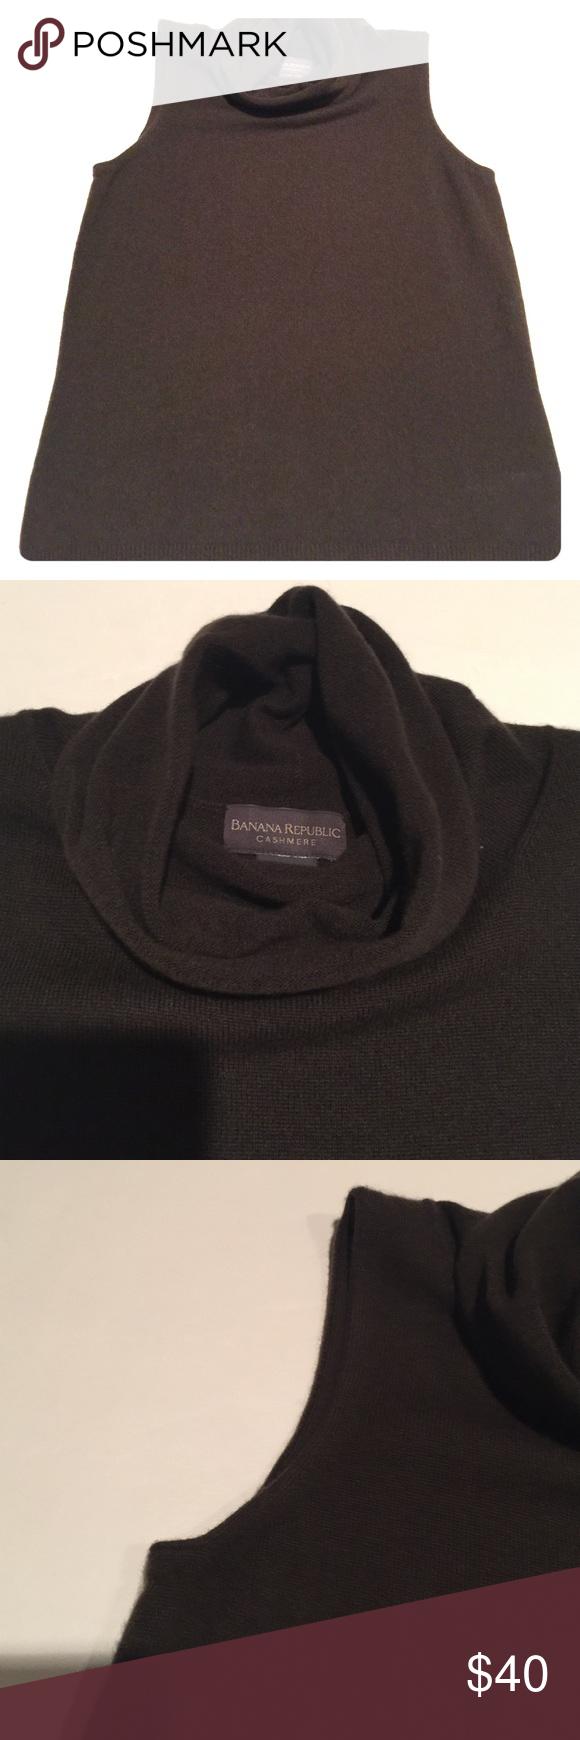 BANANA REPUBLIC: Cashmere Sweater | Cowl neck, Dark brown and ...